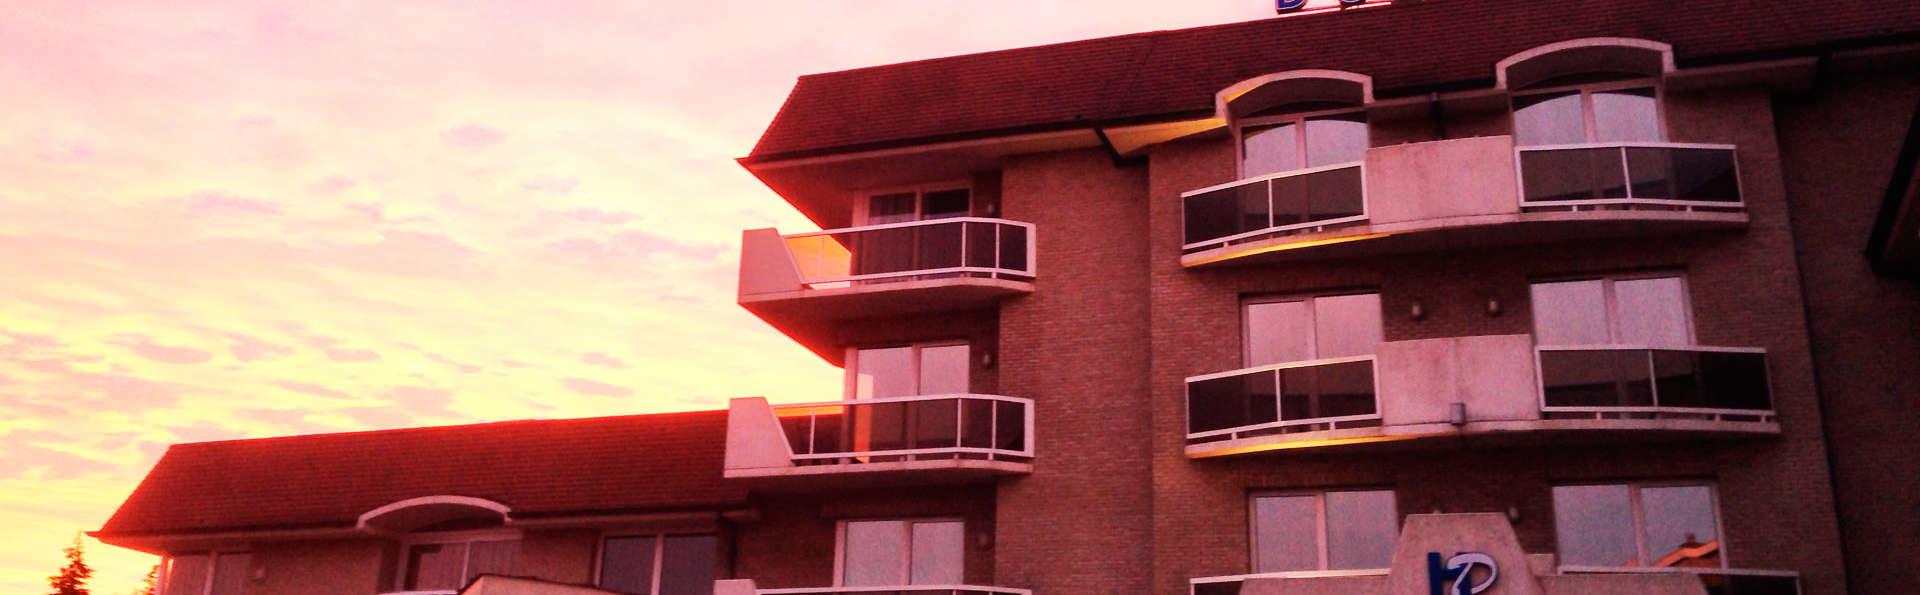 Hotel Donny (de Panne) - EDIT_NEW_front.jpg